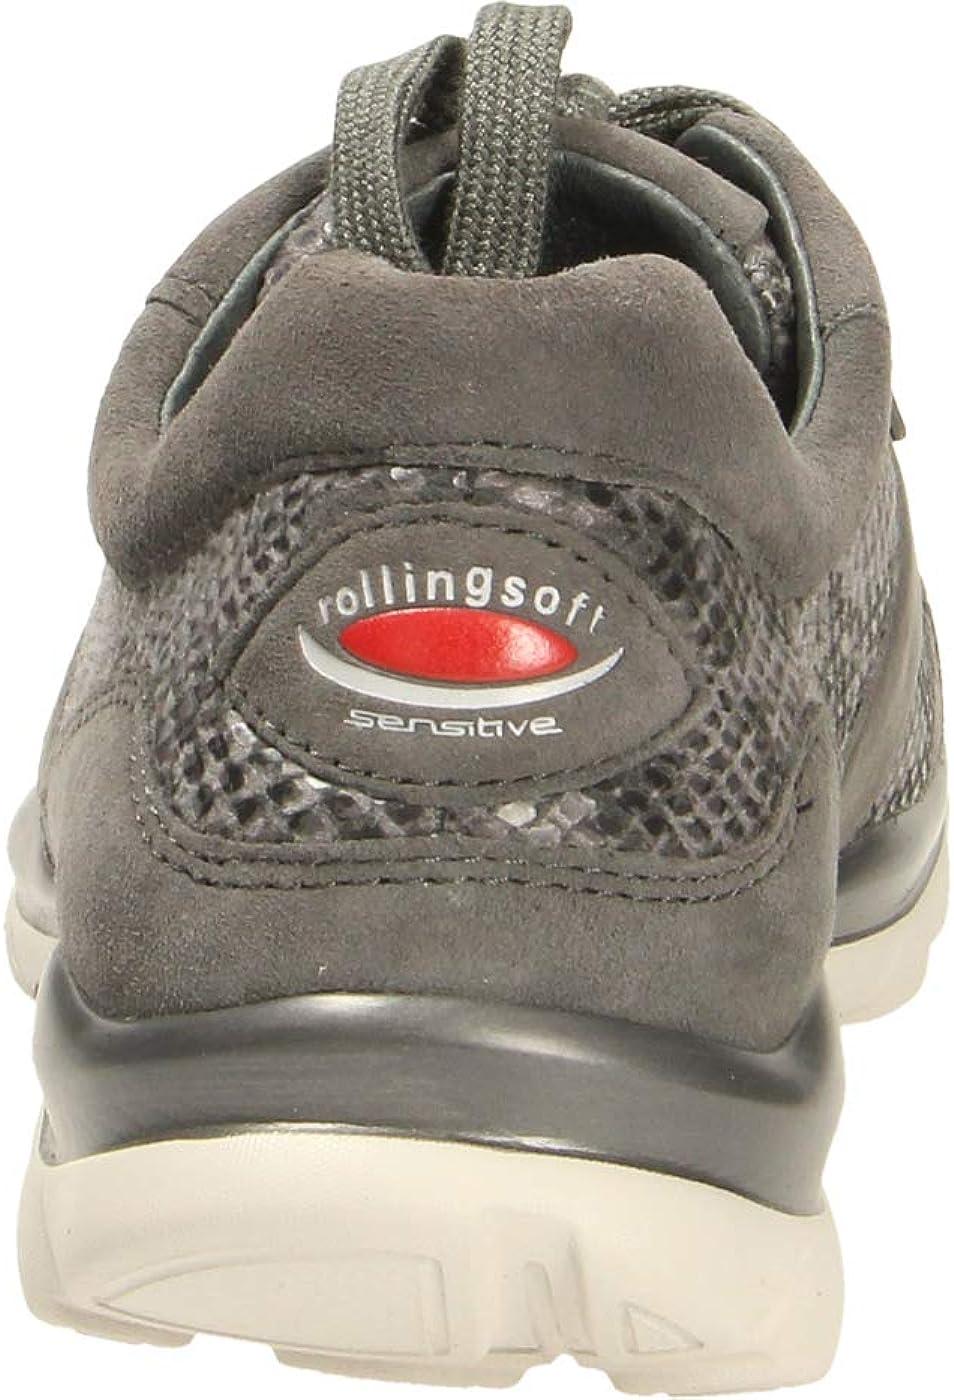 Gabor Donna Sneaker,Scarpe Sportive, Signora Basso Carbone ehp3A8